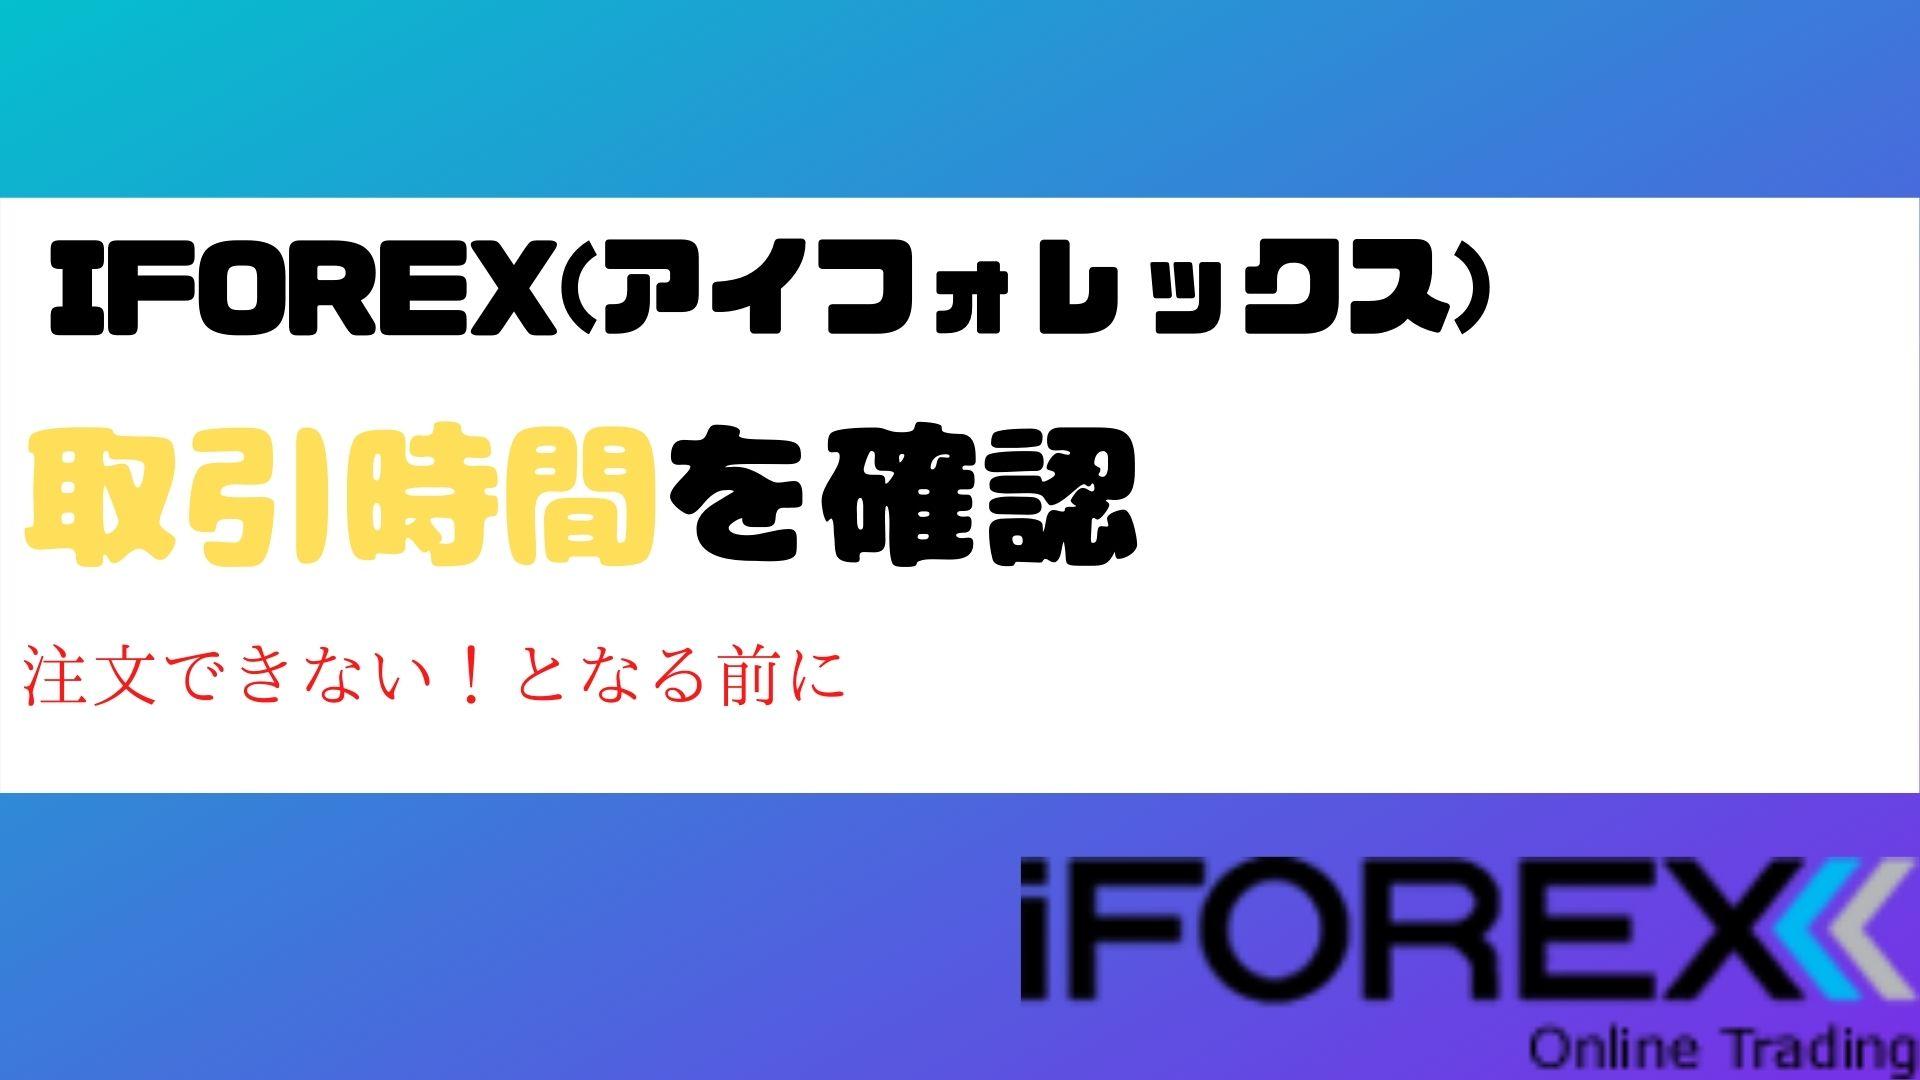 iforex-tradingtime-title